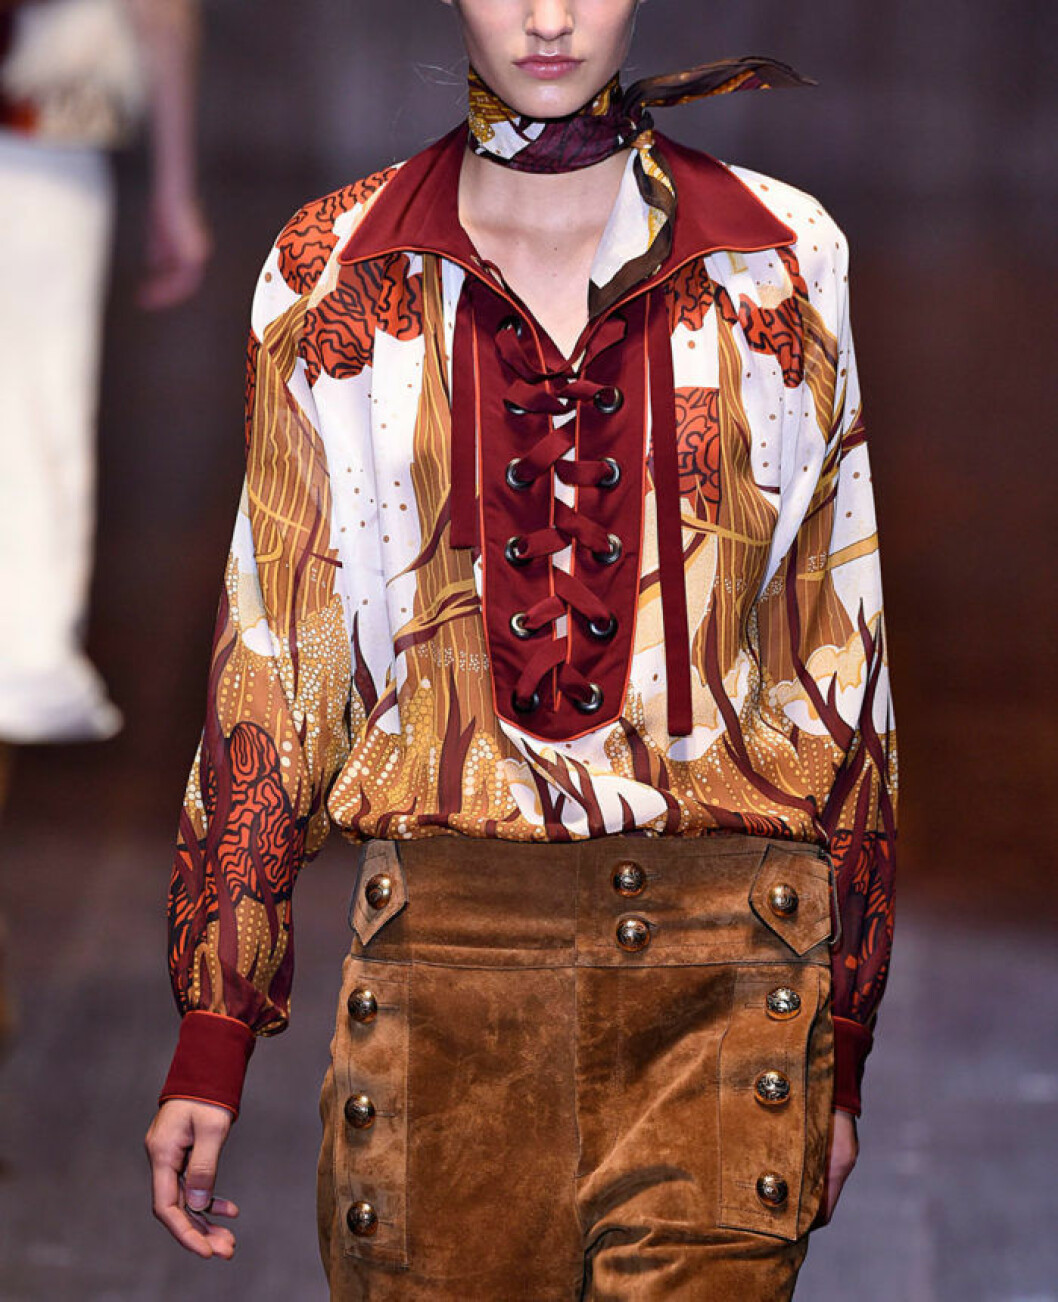 Tight knuten scarf à la Gucci våren 2015.